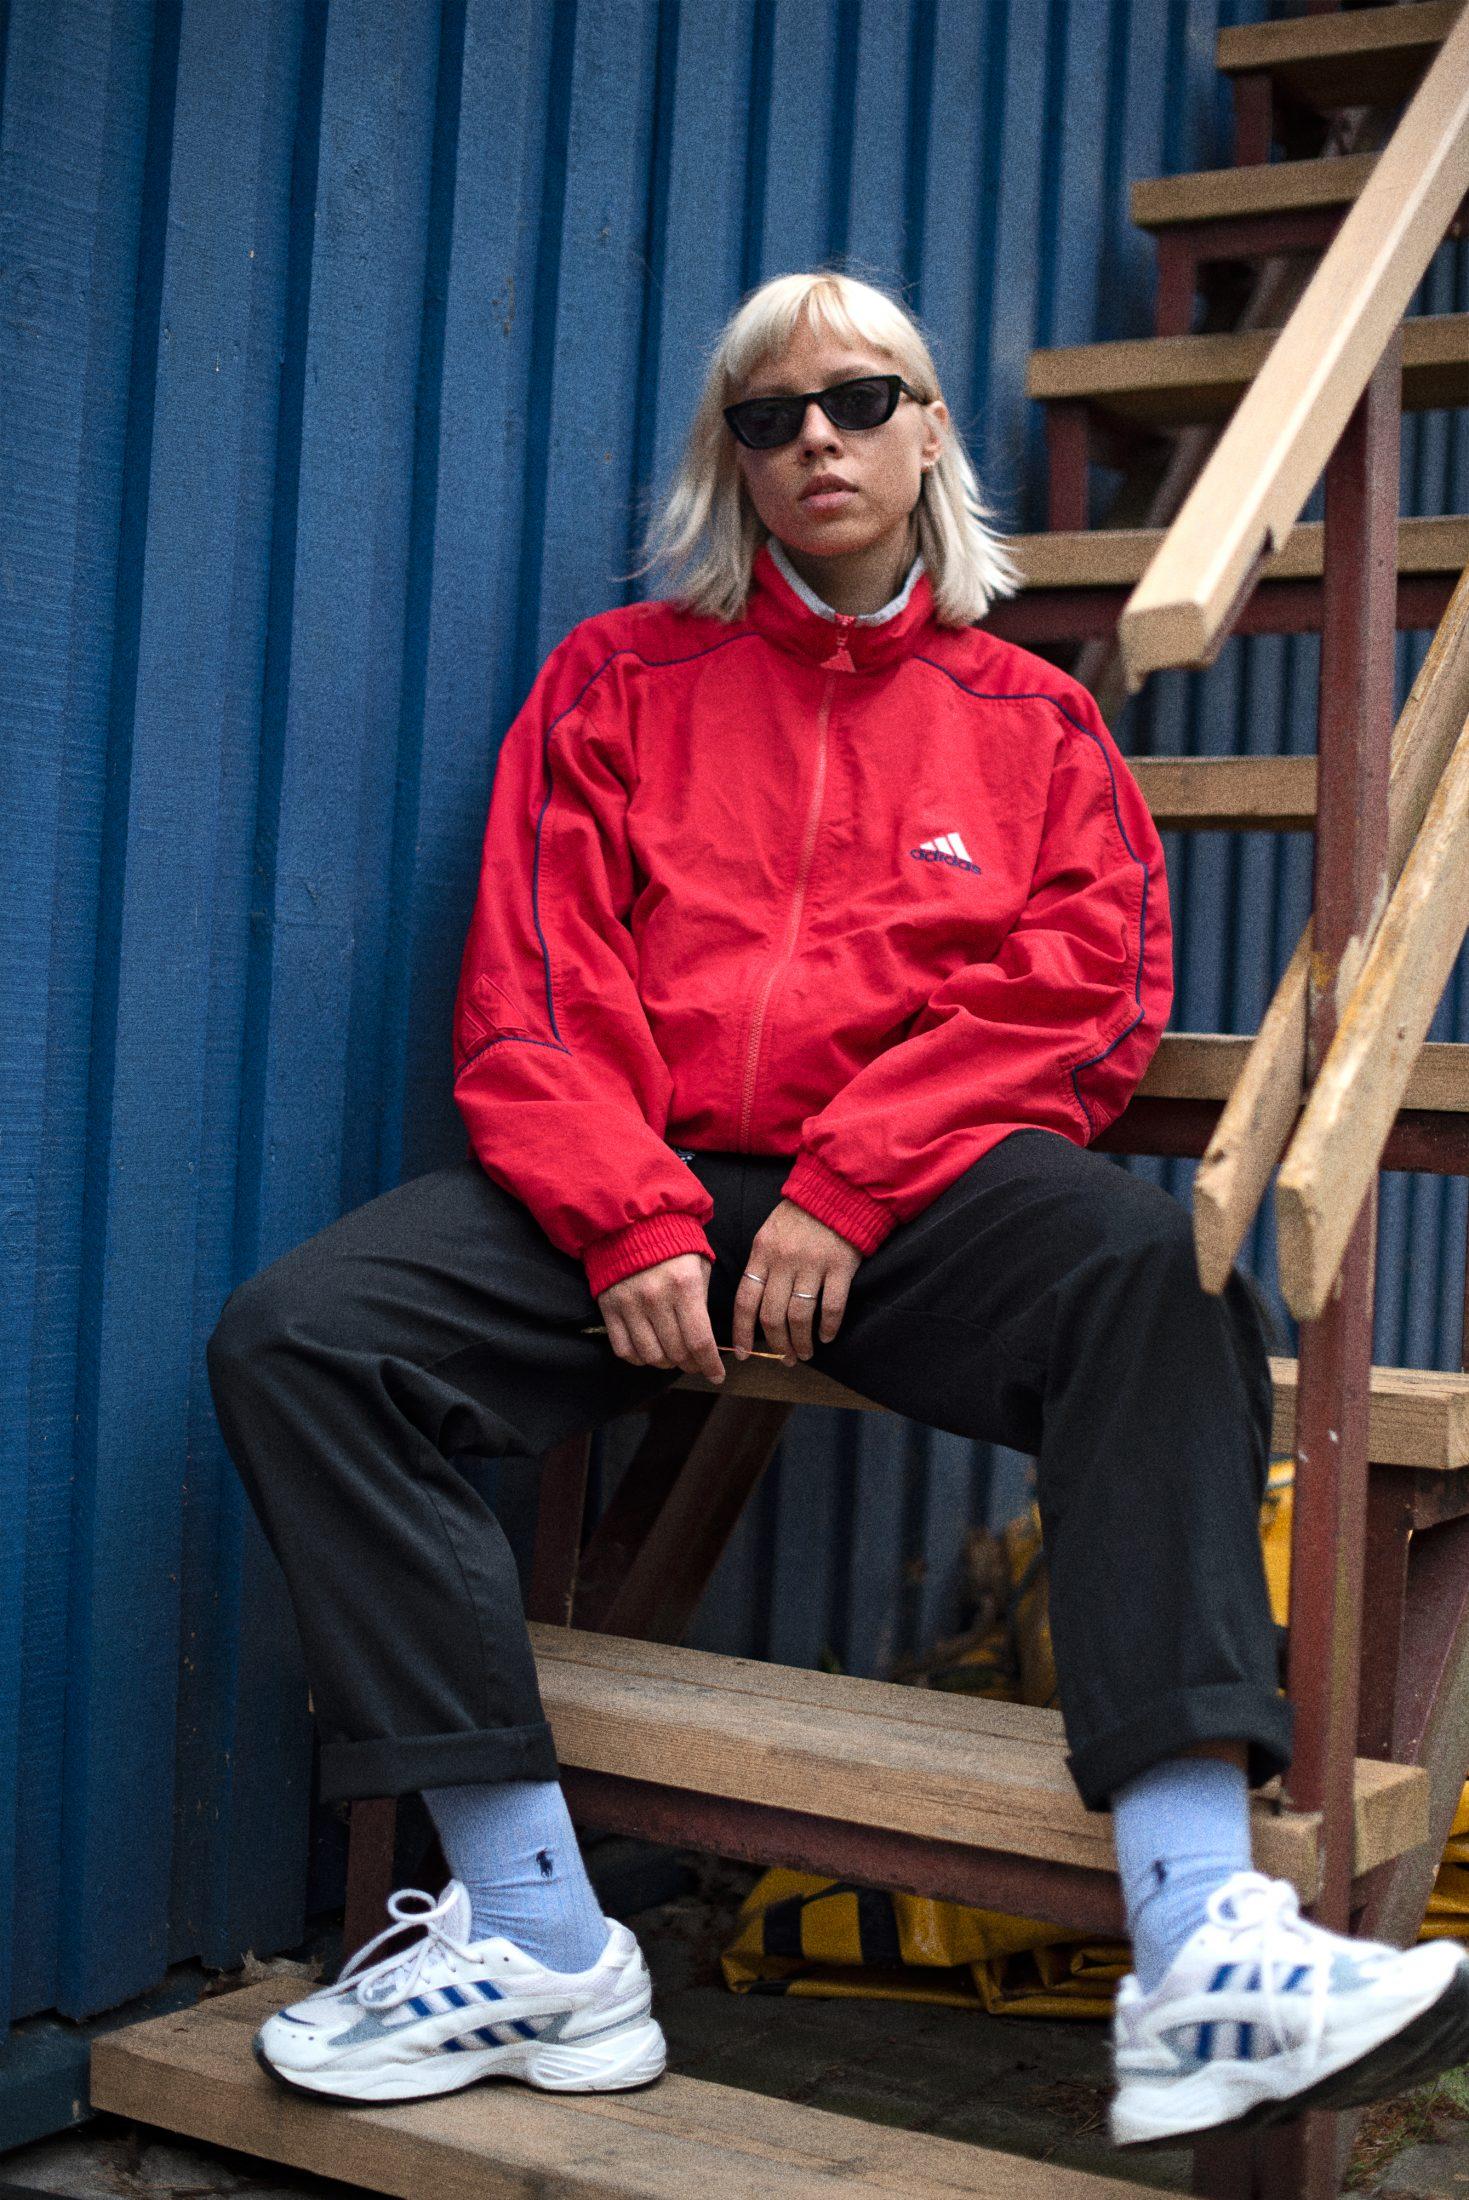 Vintage 90s Adidas red windbreaker jacket